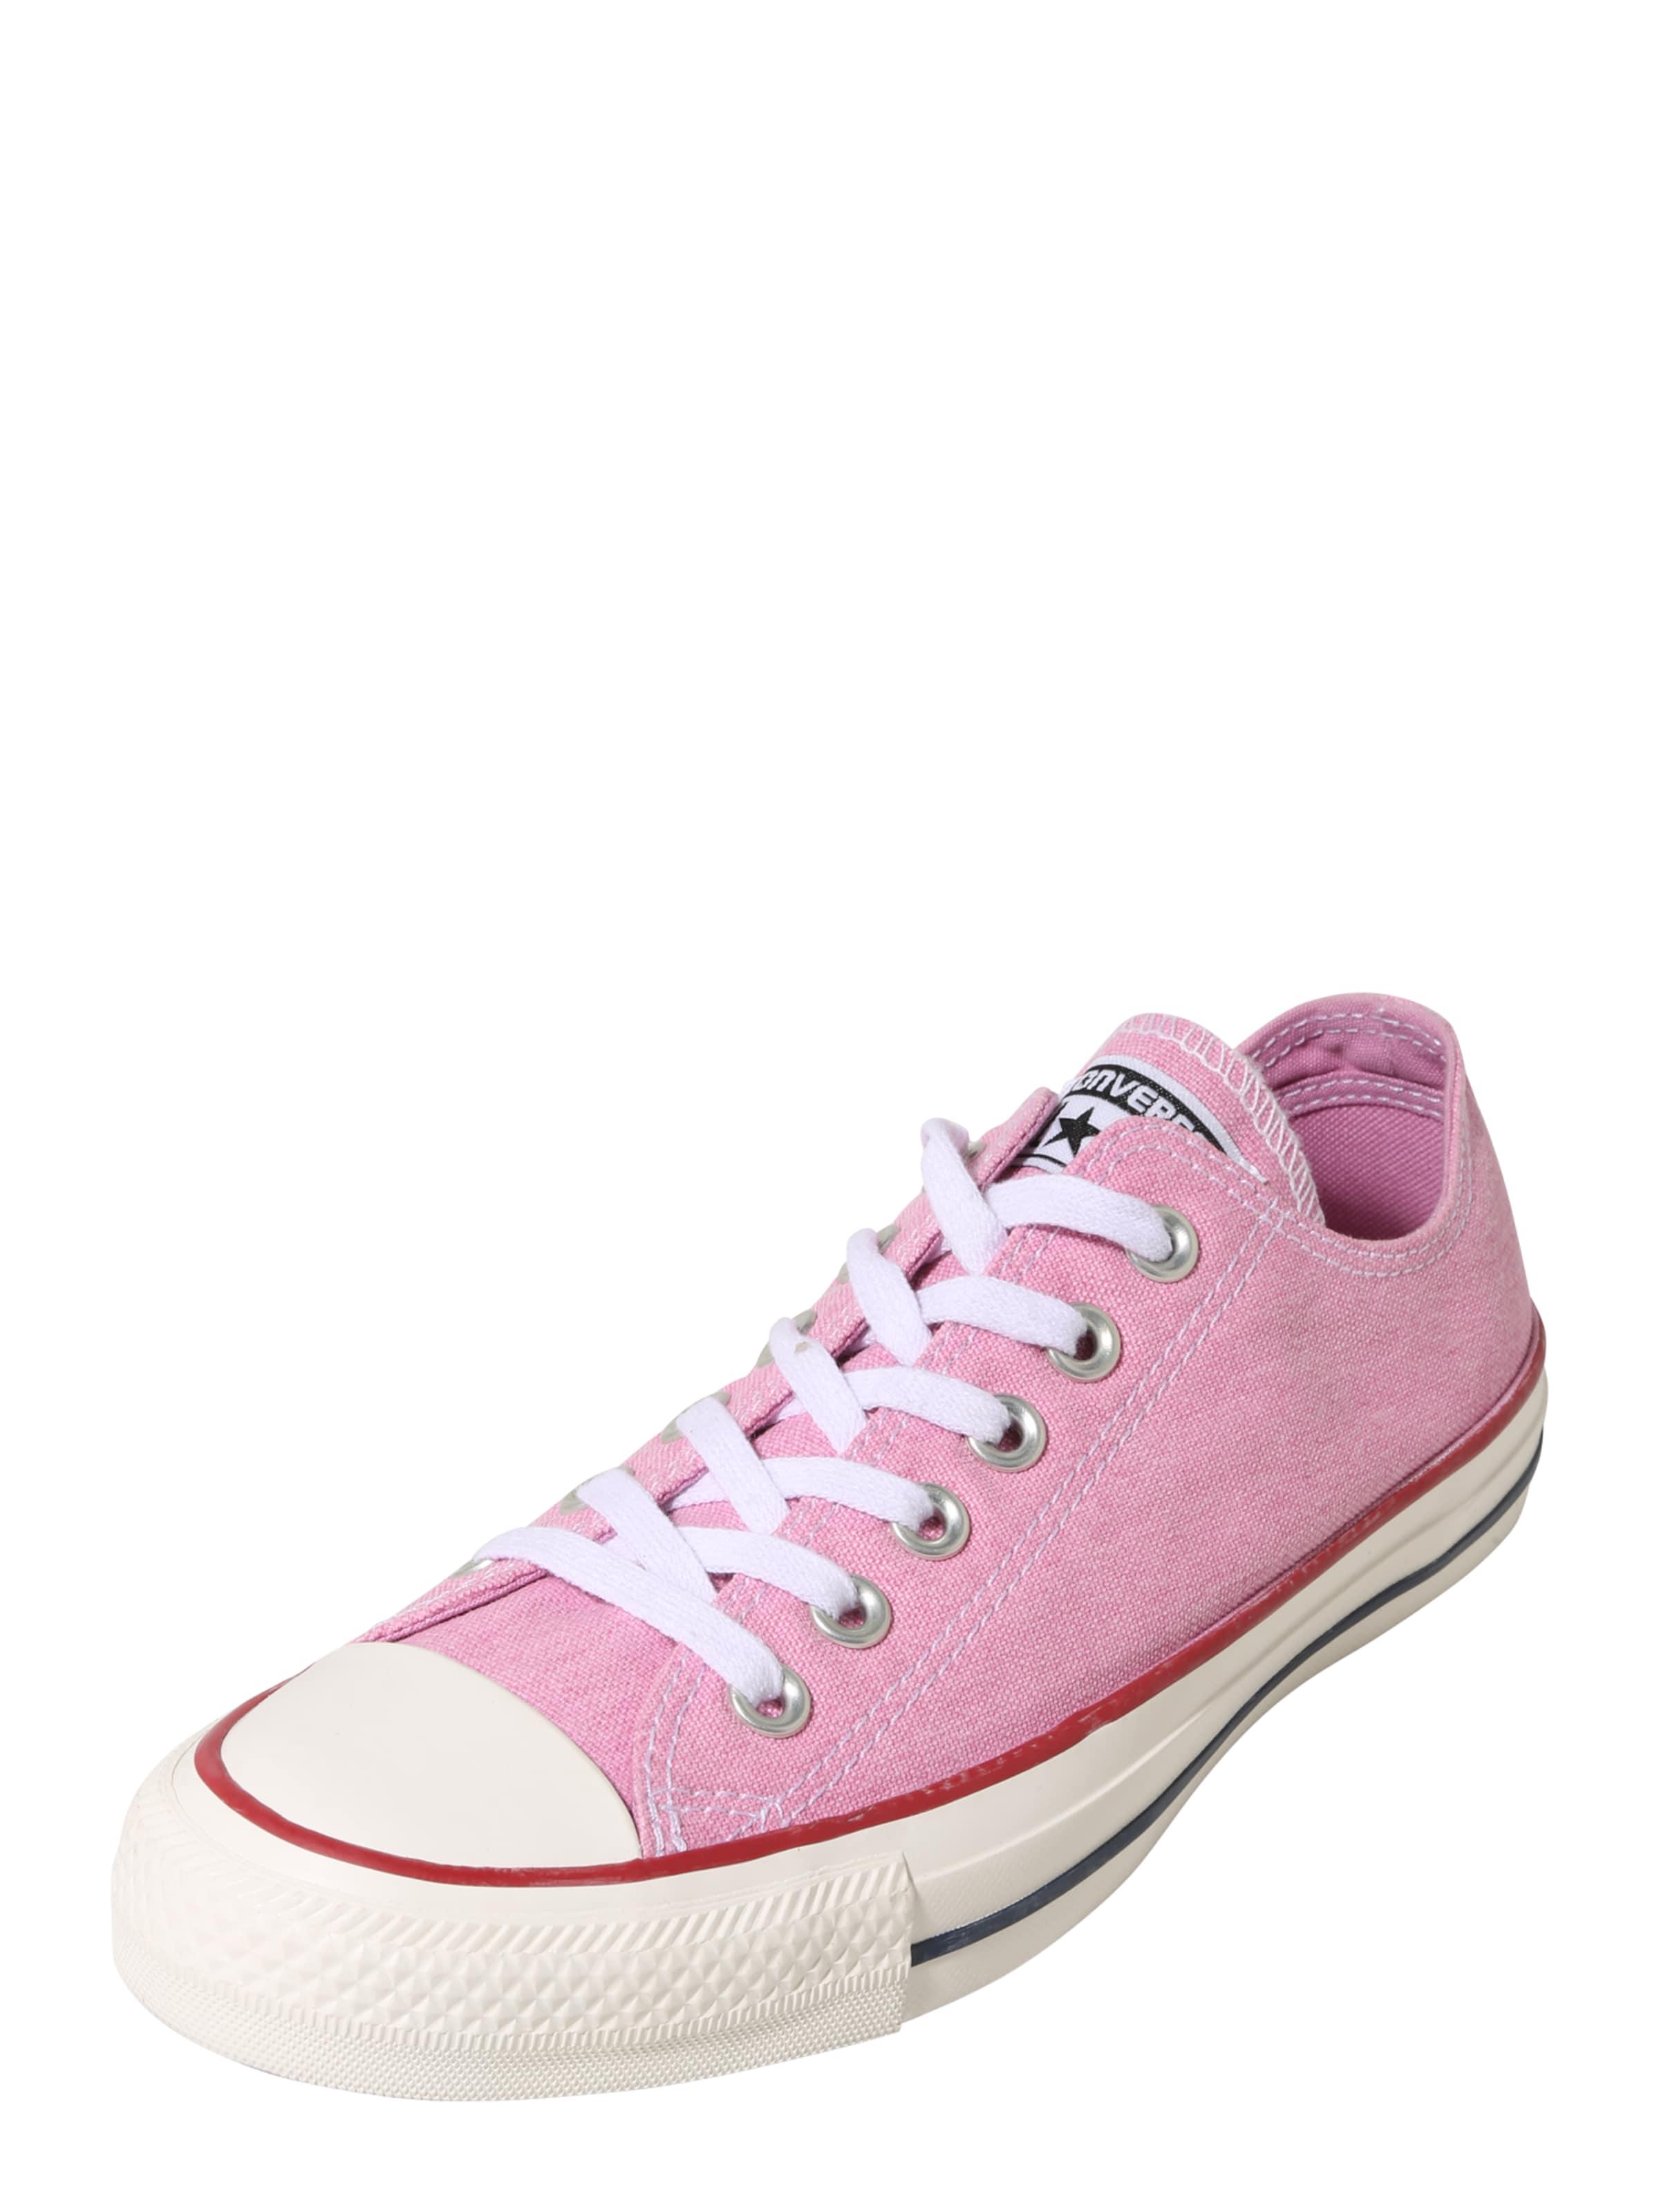 Geschäft CONVERSE Sneaker 'CHUCK TAYLOR ALL STAR - OX' Shop Für Günstigen Preis Bester Speicher Billig Online Zu Bekommen Aussicht Spielraum Original 8lMho74OU